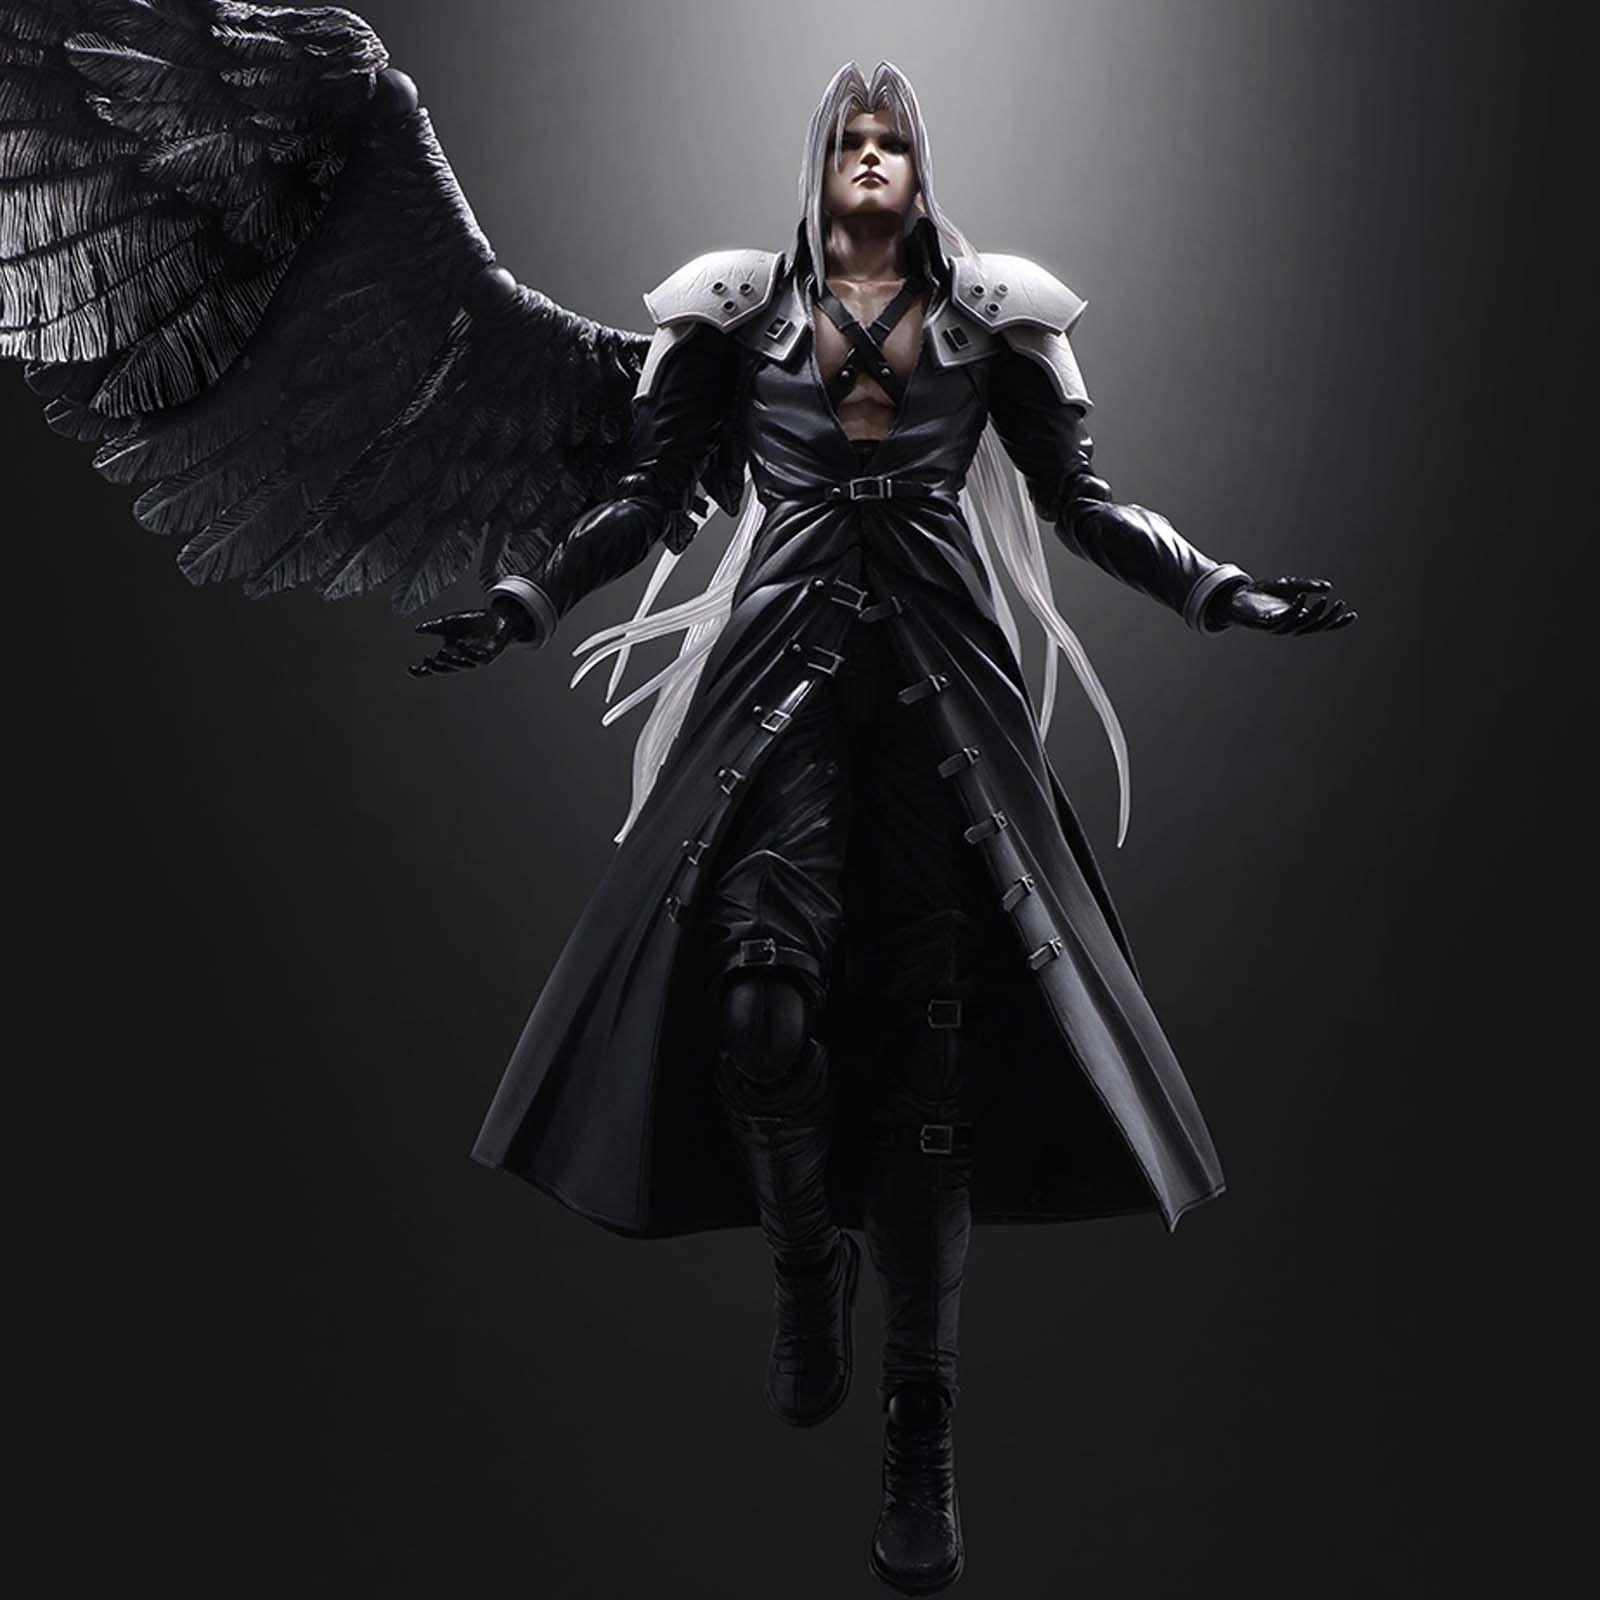 Anime Play Arts Kai Final Fantasy 7 VII Sephiroth PVC Action Figure Statue Model